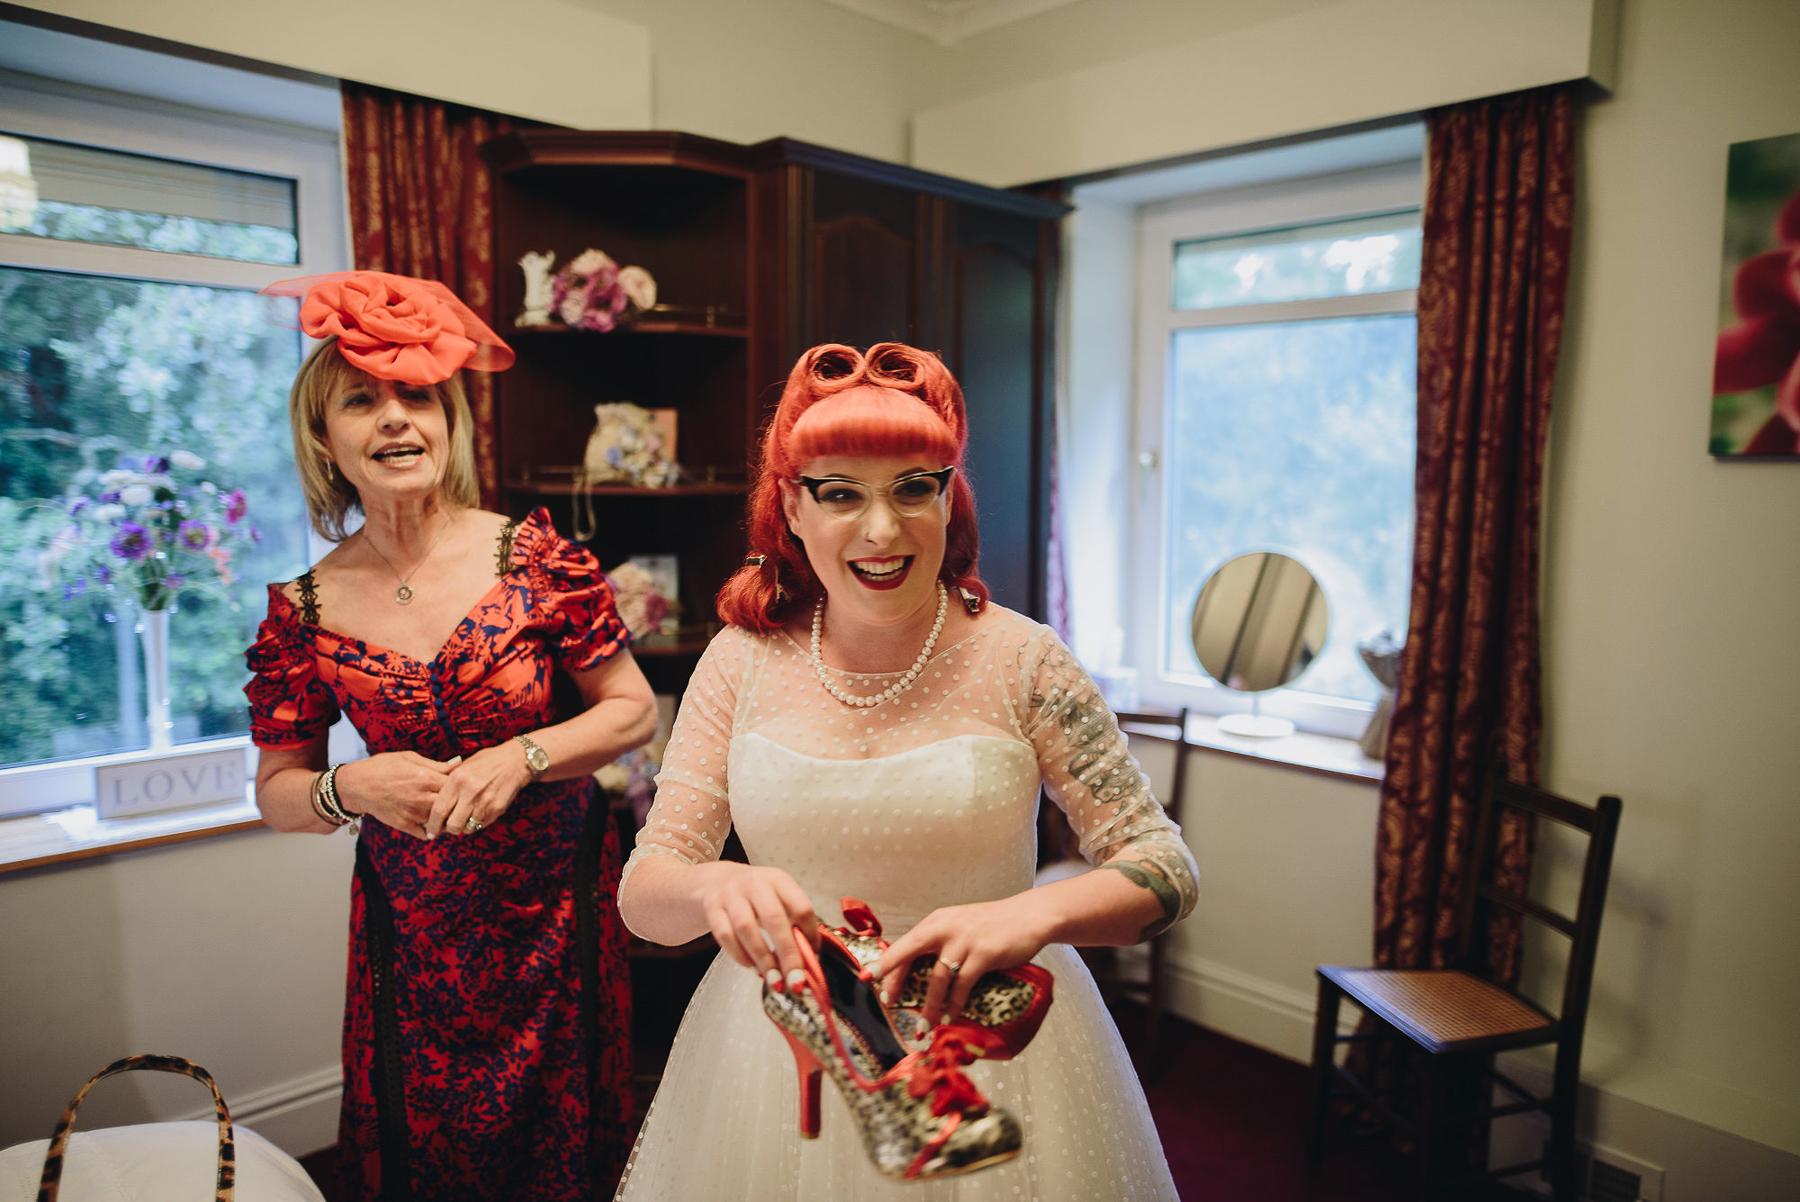 Wellbeing_Farm_Wedding_Photography_The_Pin-Up_Bride_Lara_Shaun-35.jpg